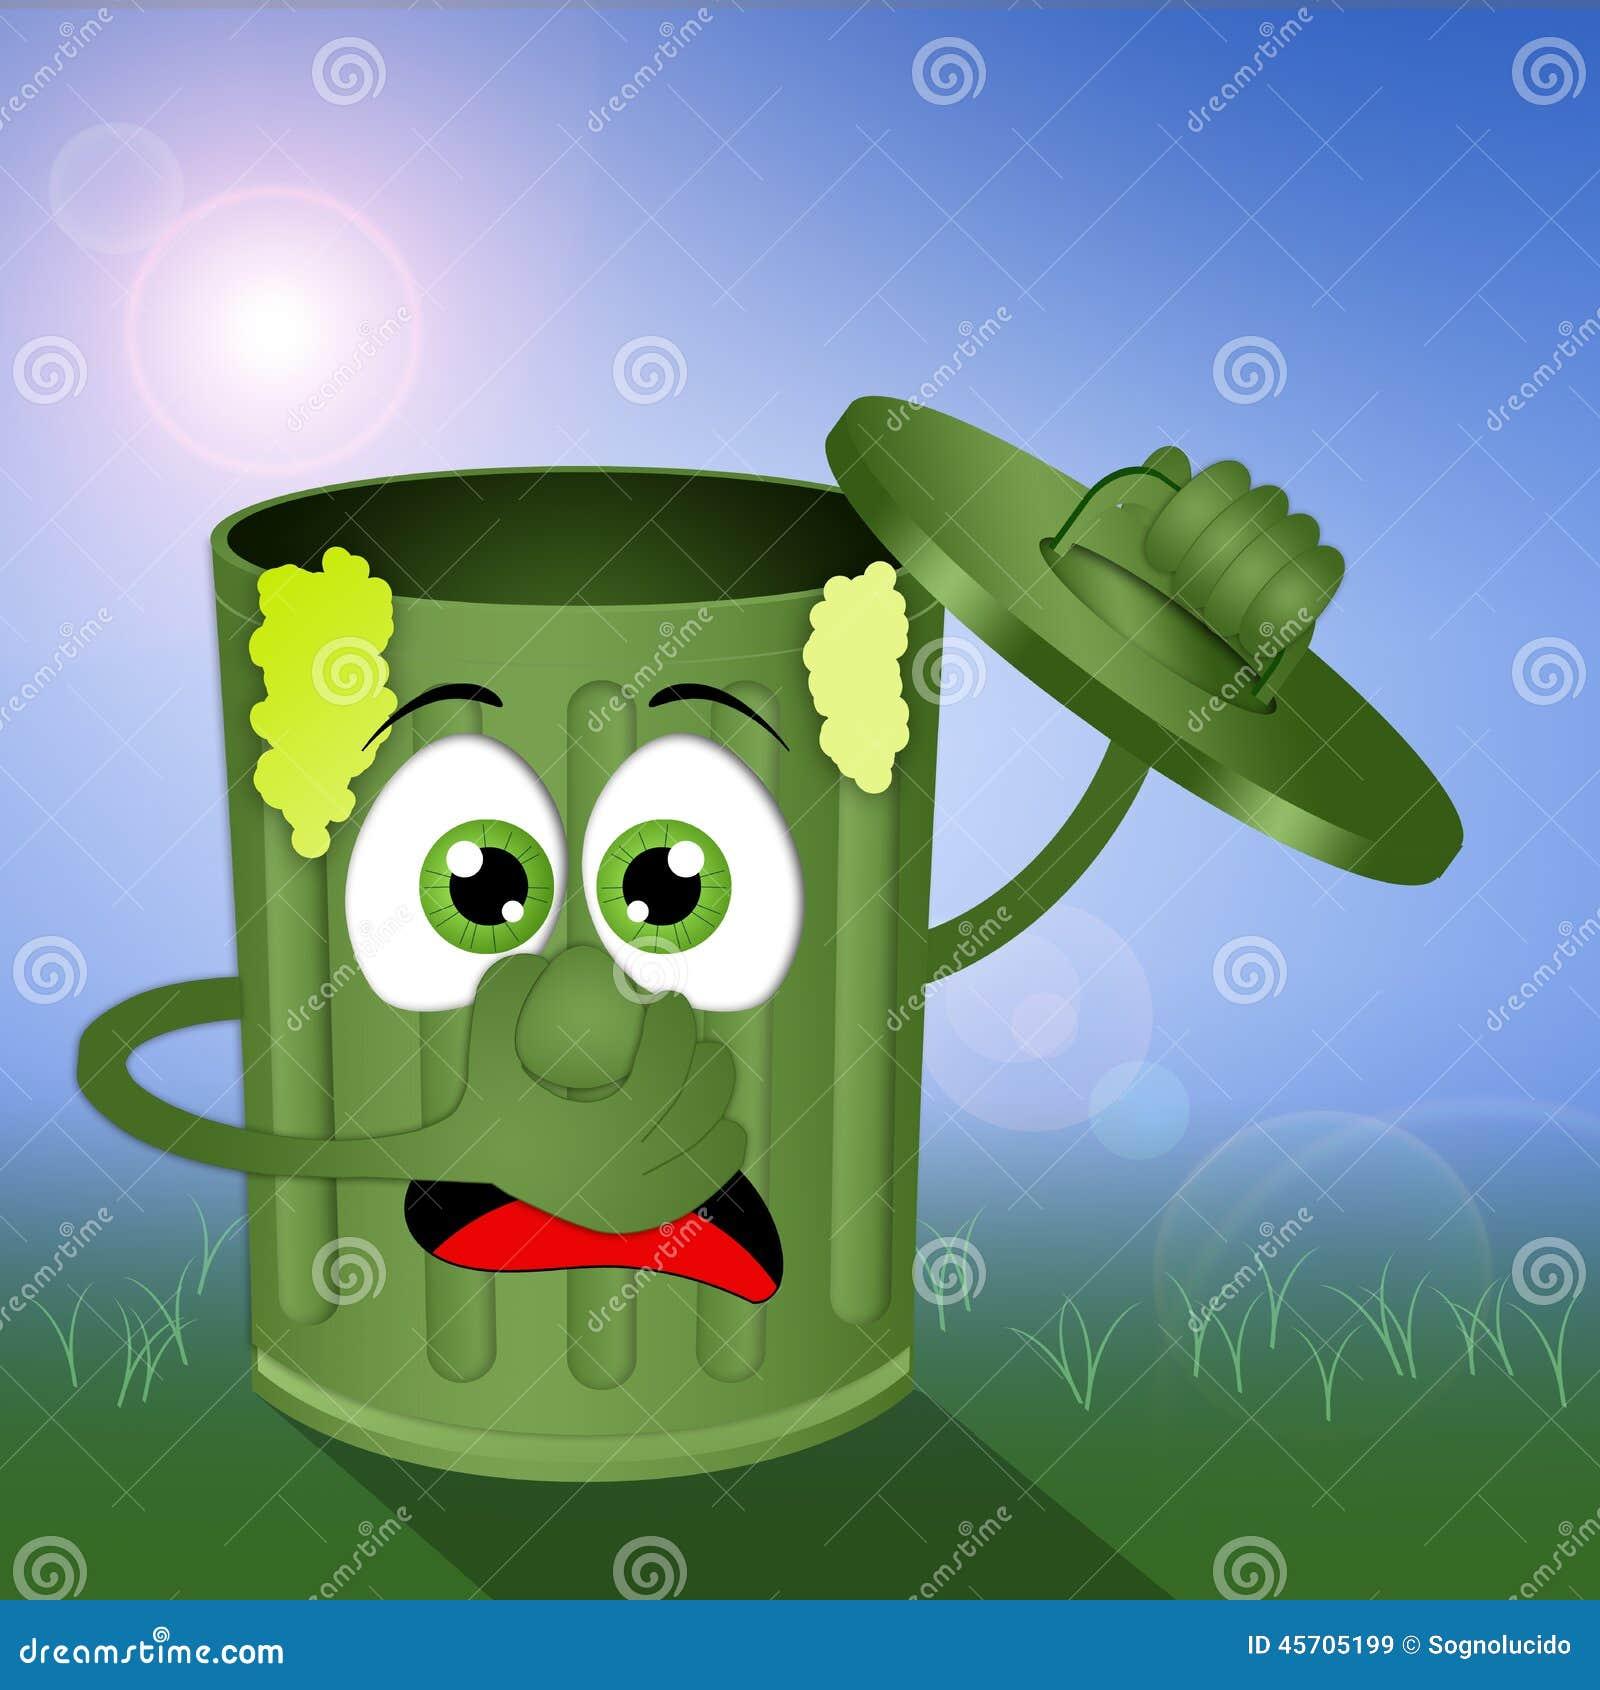 Смешное зеленое вонючее мусорное ведро